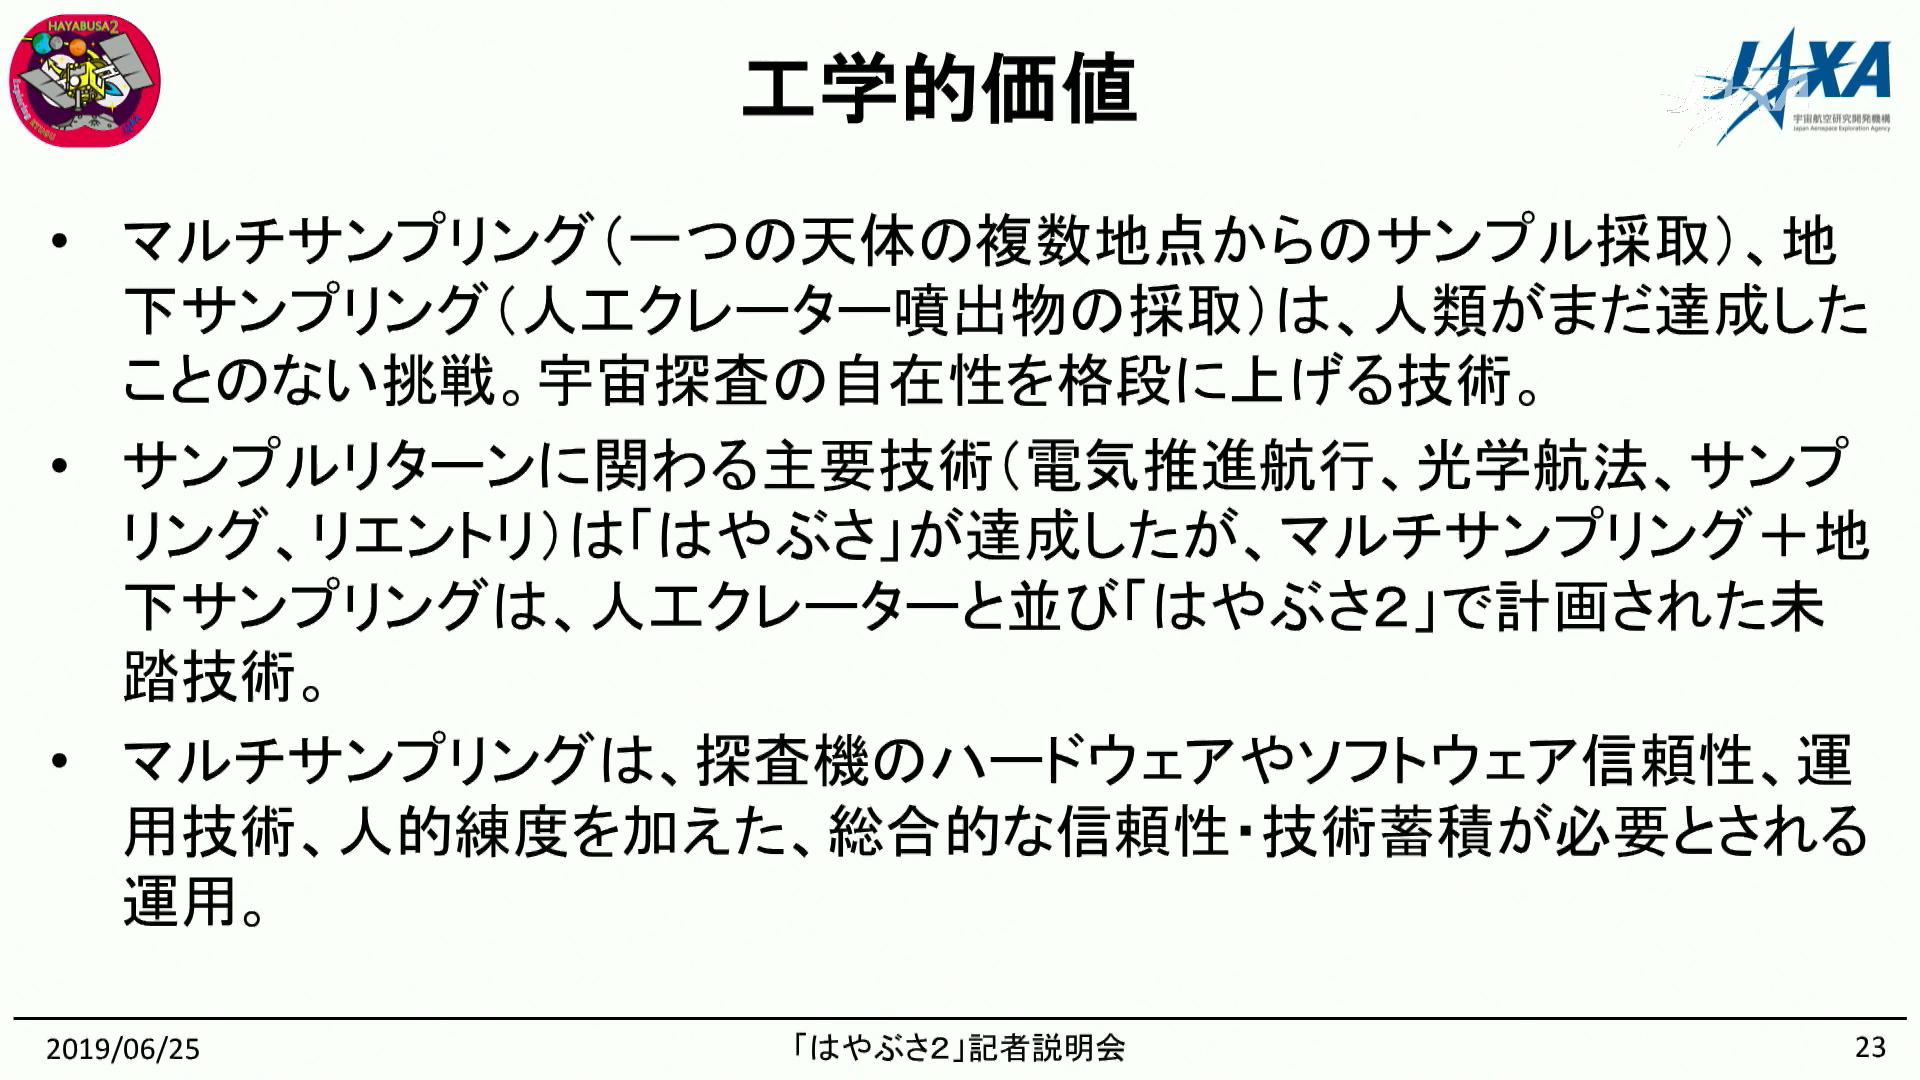 f:id:Imamura:20190625234901p:plain